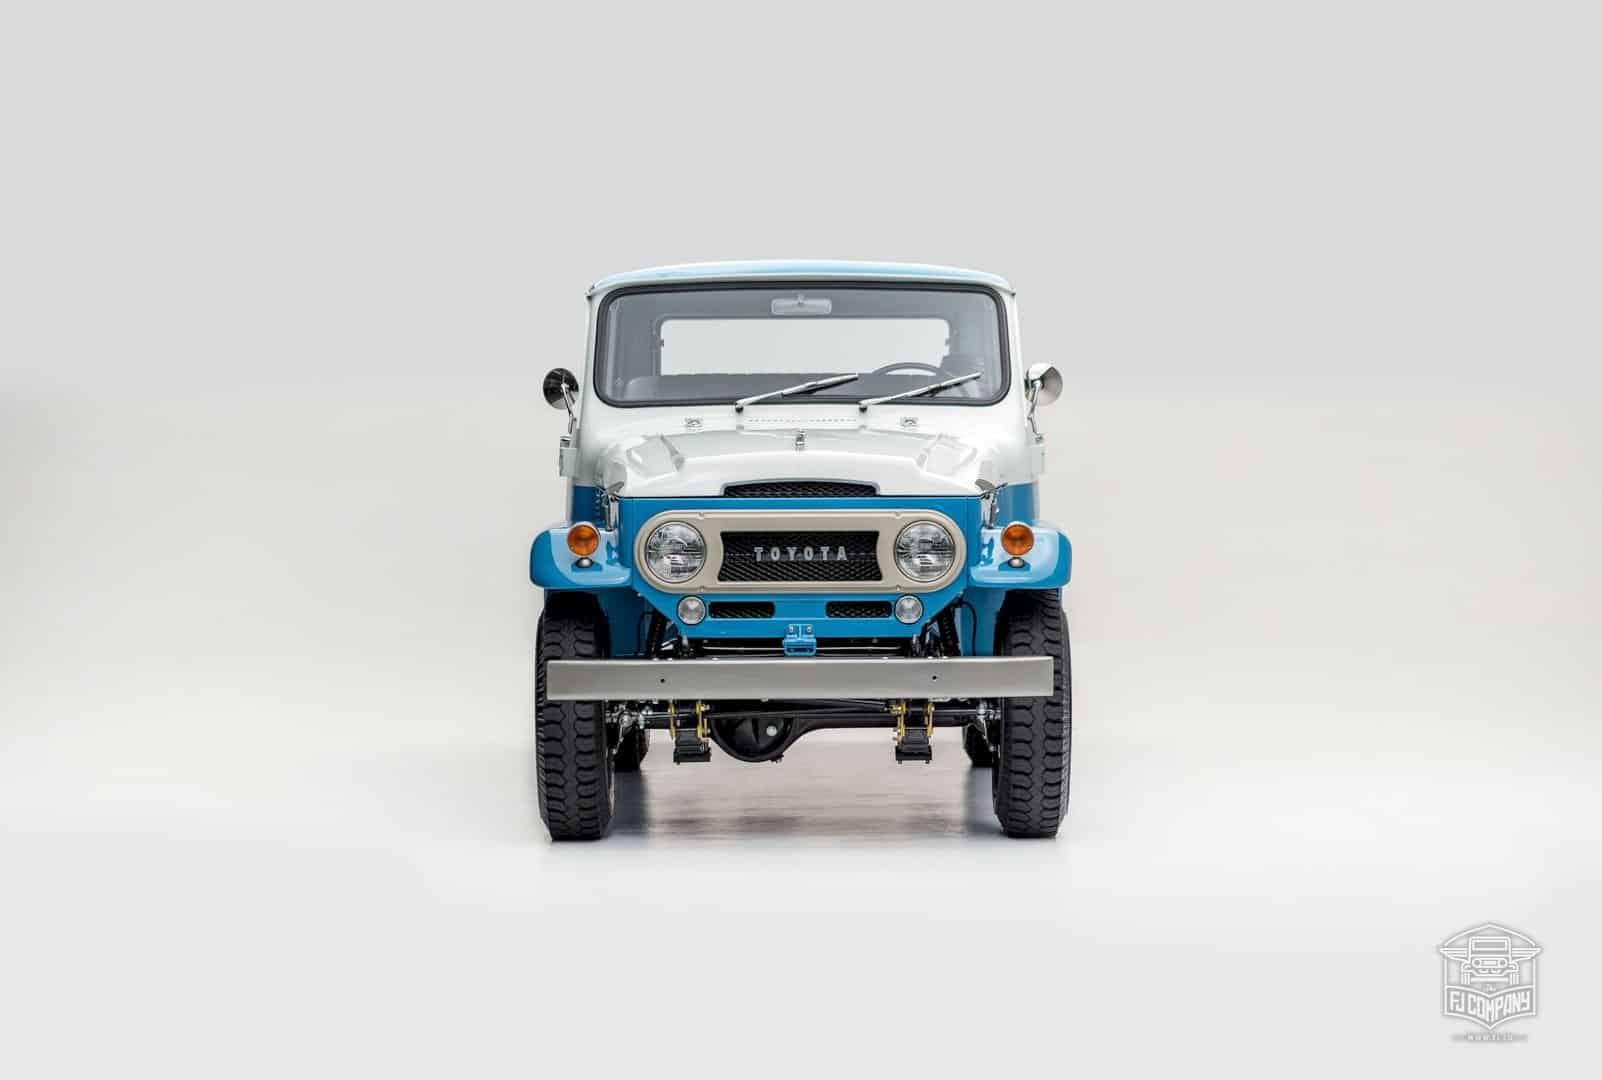 1967 Toyota Land Cruiser Fj45lv Capri Blue 5